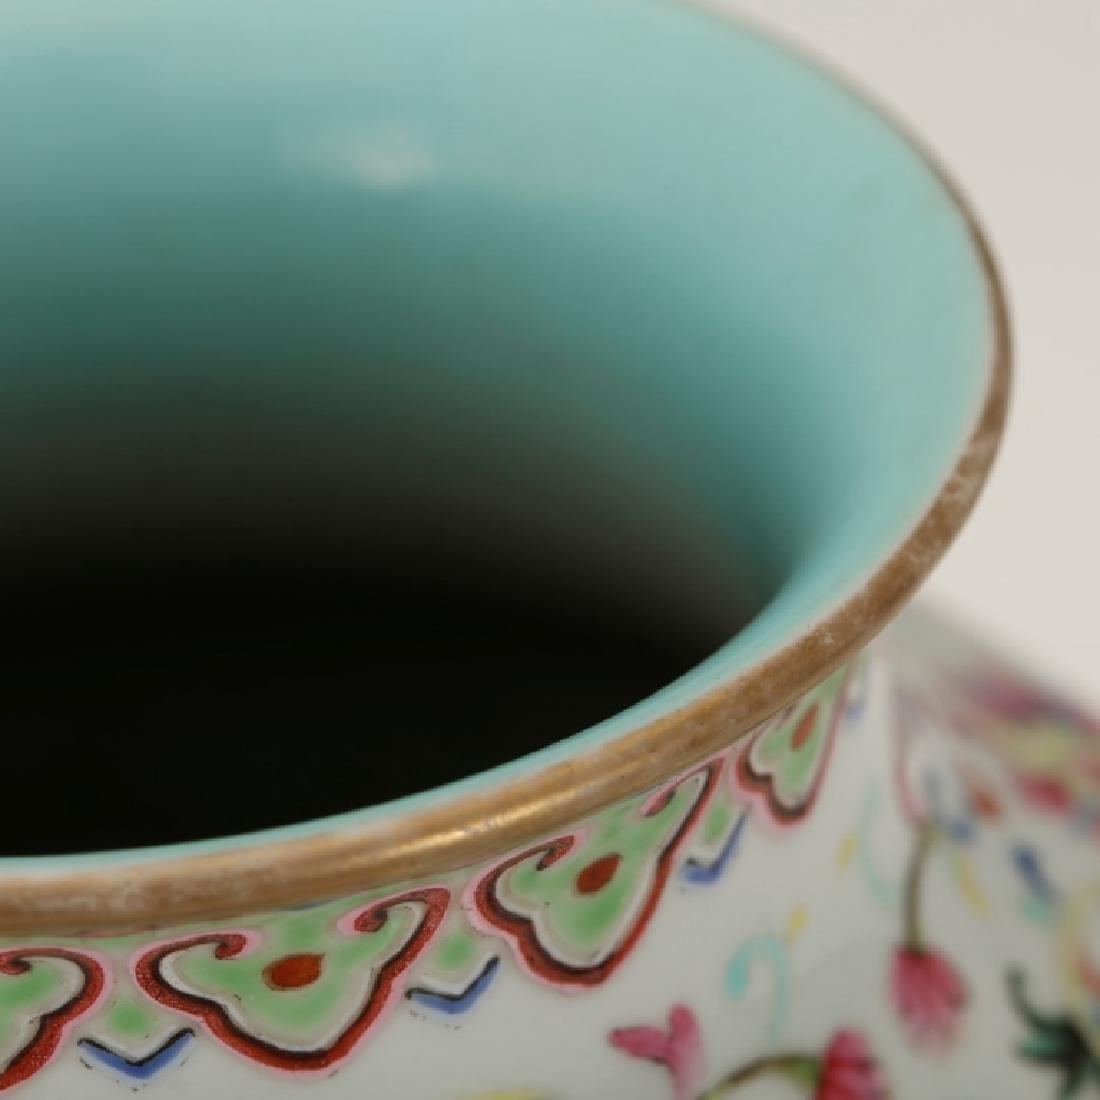 Chinese 19th C Famille Rose Enameled Porcelain - 3